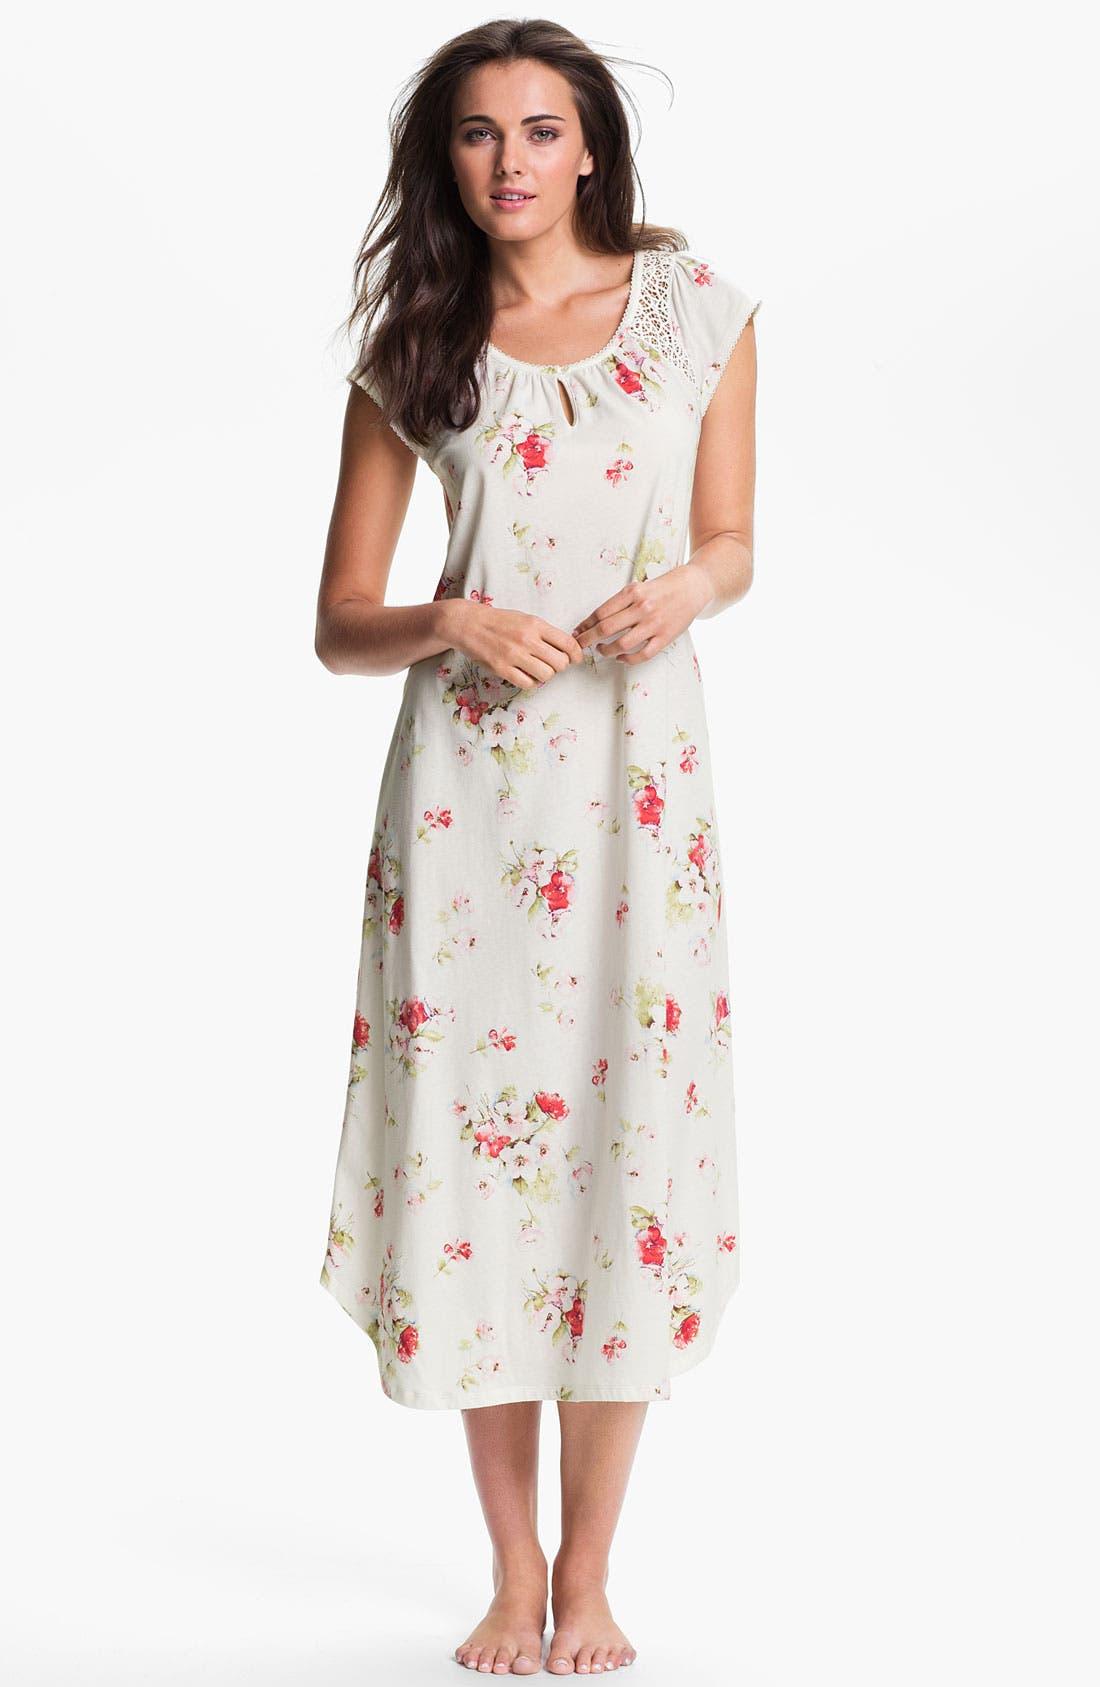 Main Image - Carole Hochman Designs 'Roseberry Amaryllis' Nightgown